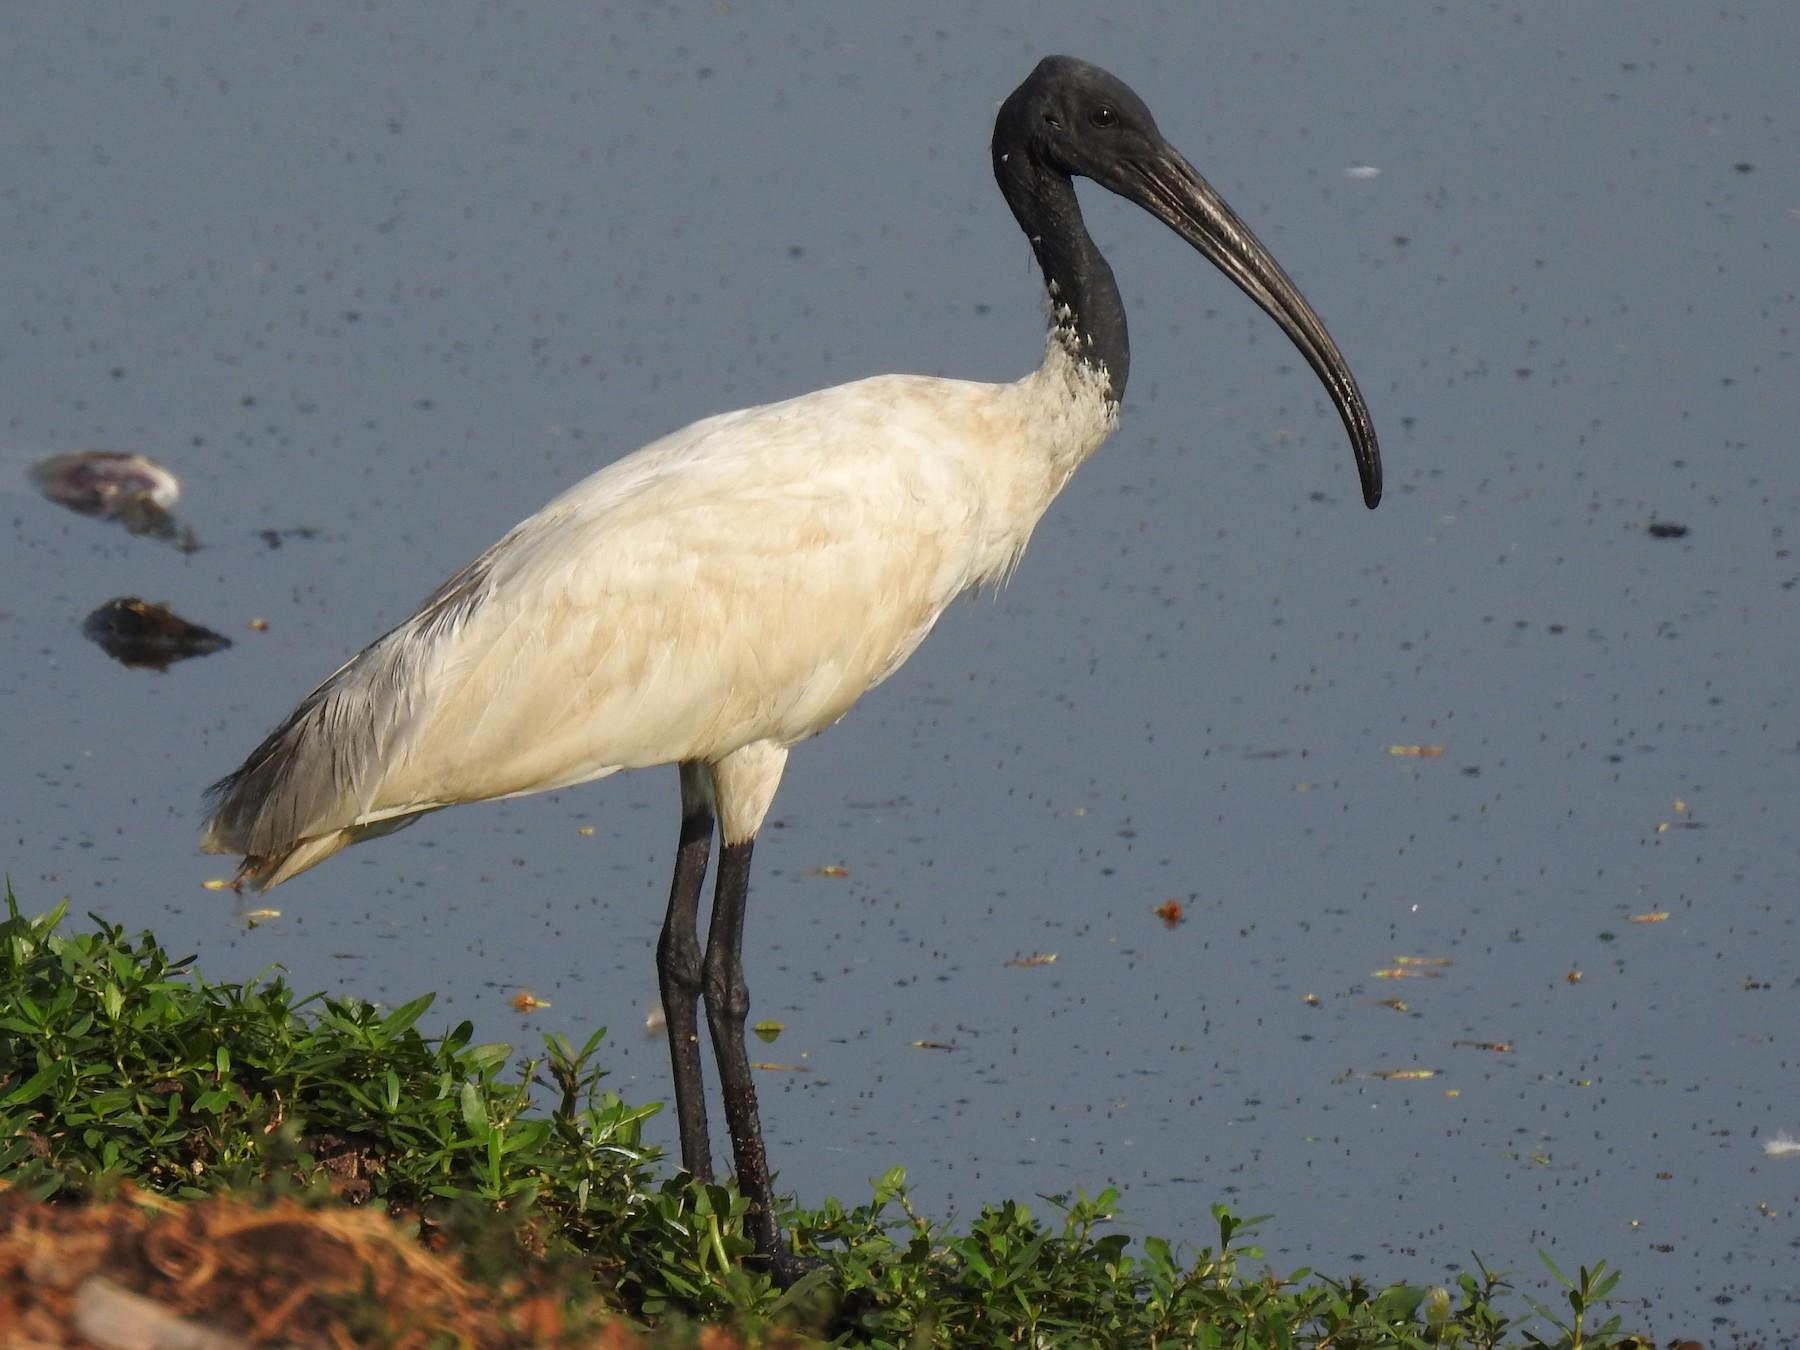 Black-headed Ibis - G Parameswaran